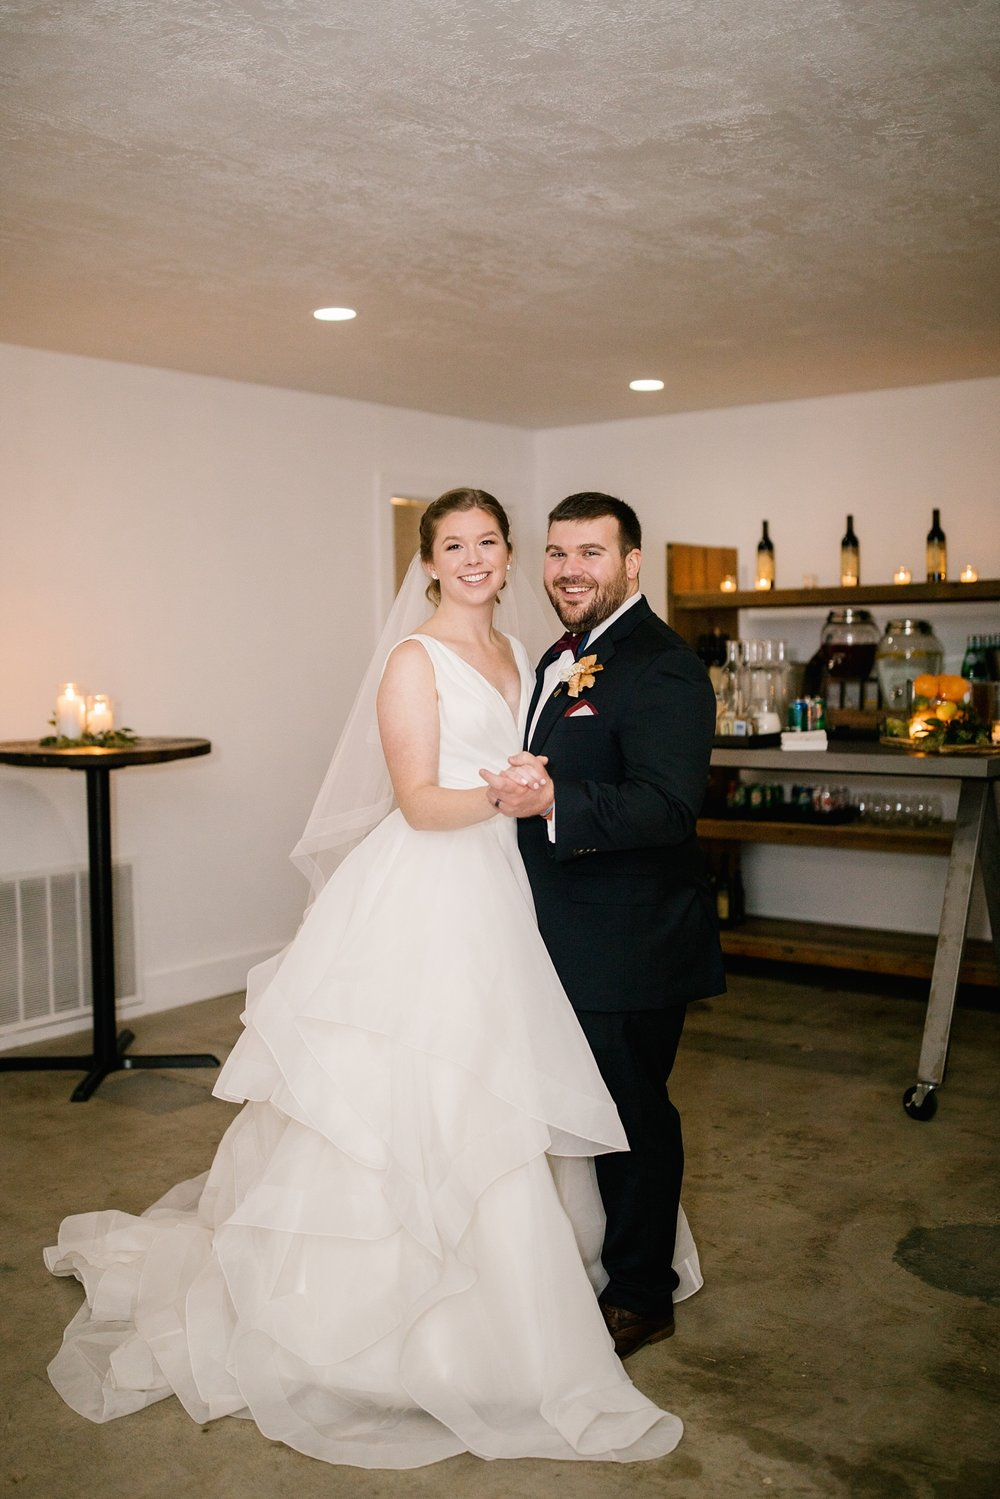 CN-Wedding-431_Lizzie-B-Imagery-Utah-Wedding-Photographer-Blessed-Sacrament-Catholic-Church-Sandy-Utah-The-Blended-Table-Salt-Lake-City.jpg